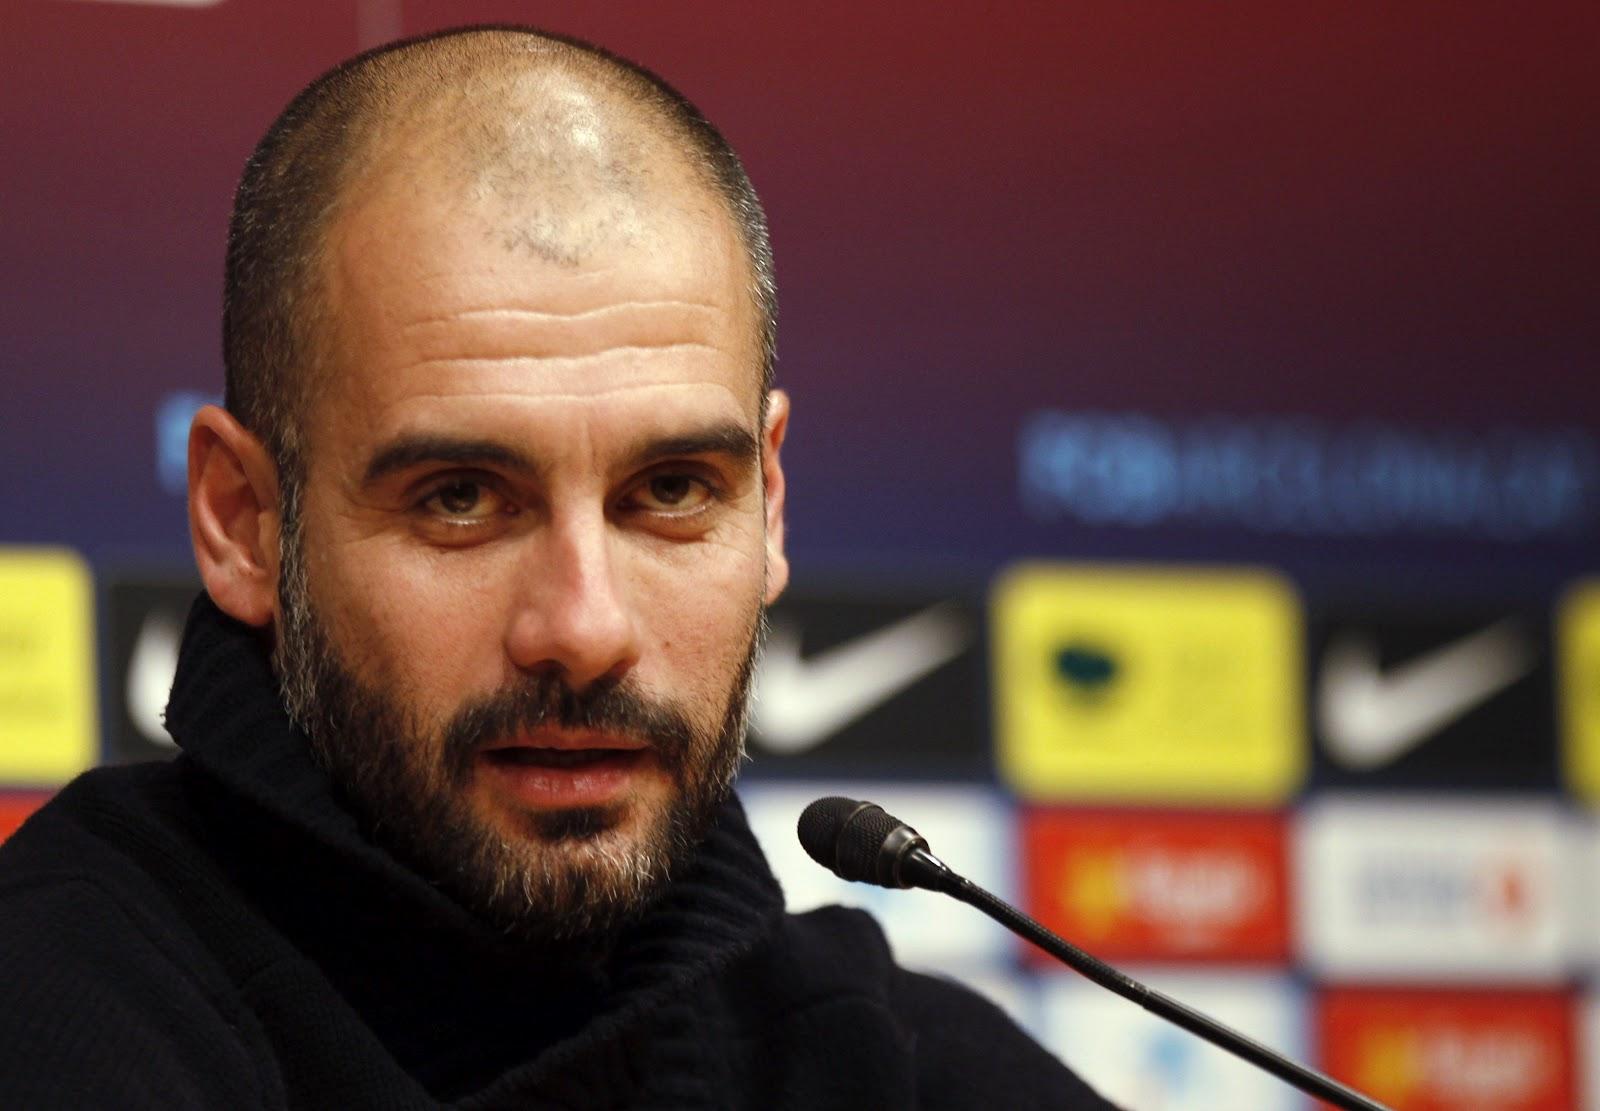 http://www.bdmorning.com/en/wp-content/uploads/2015/05/Pep-Guardiola4.jpg